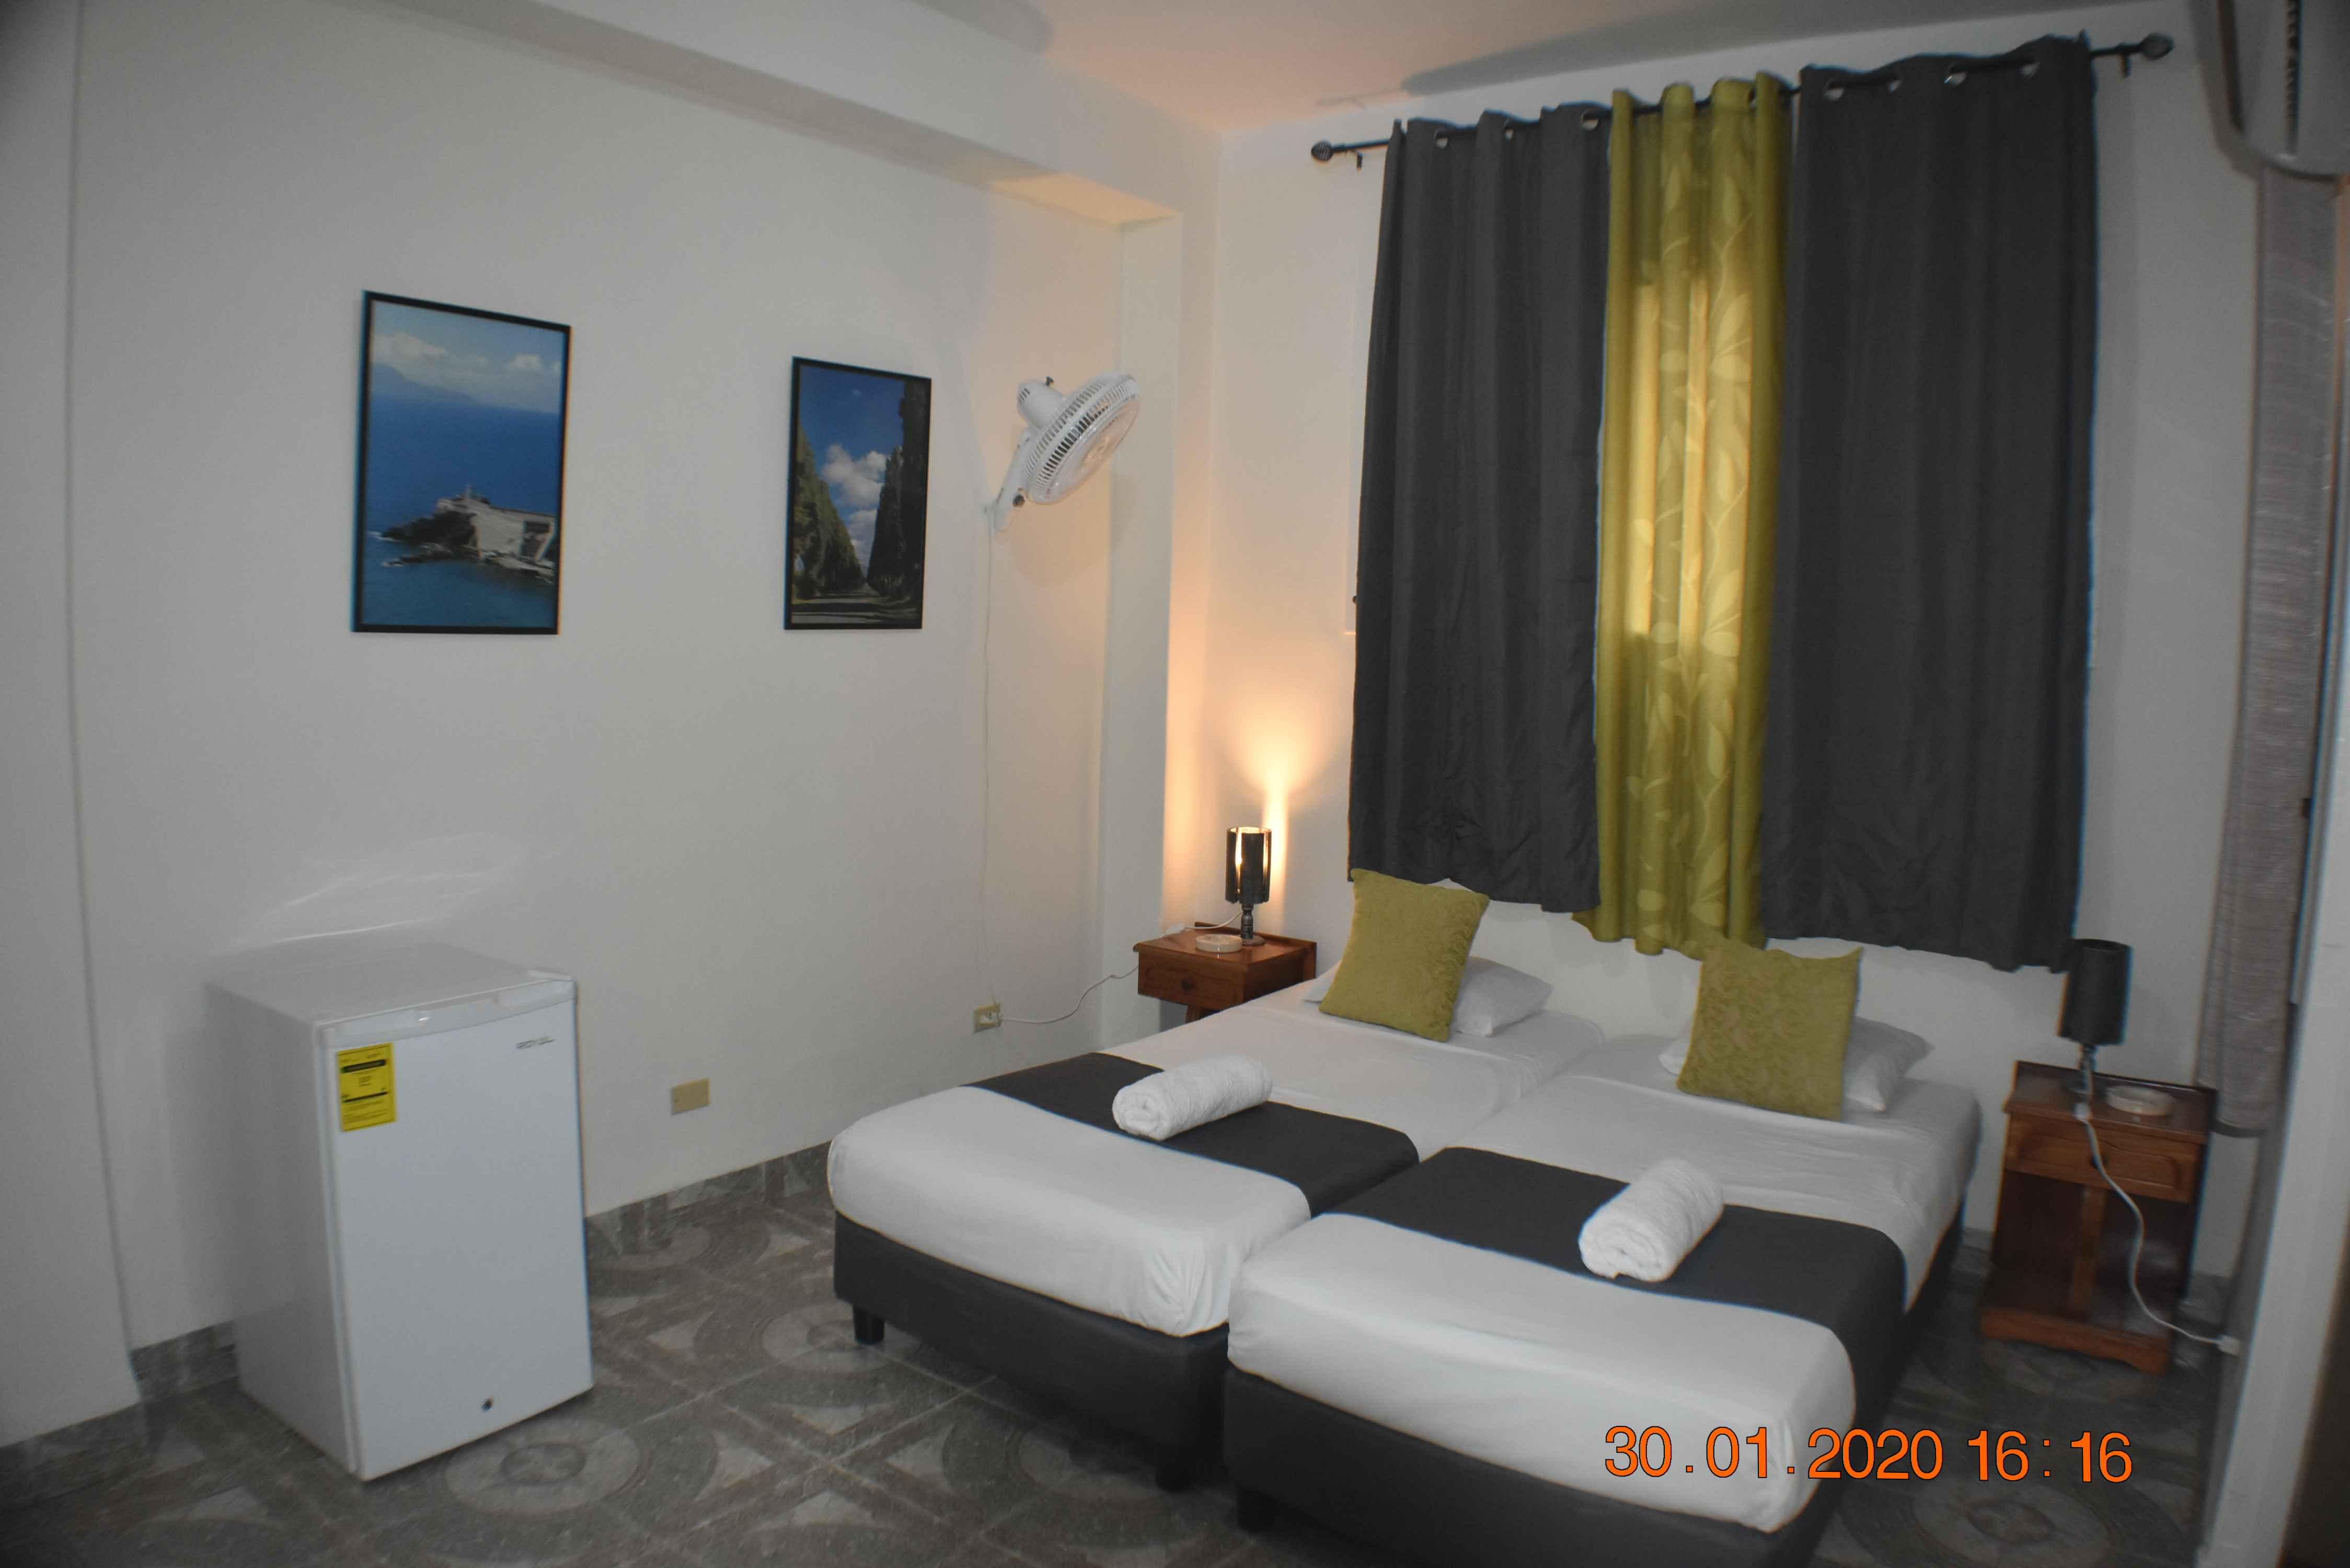 HAV205 – Room 2 Triple room with private bathroom